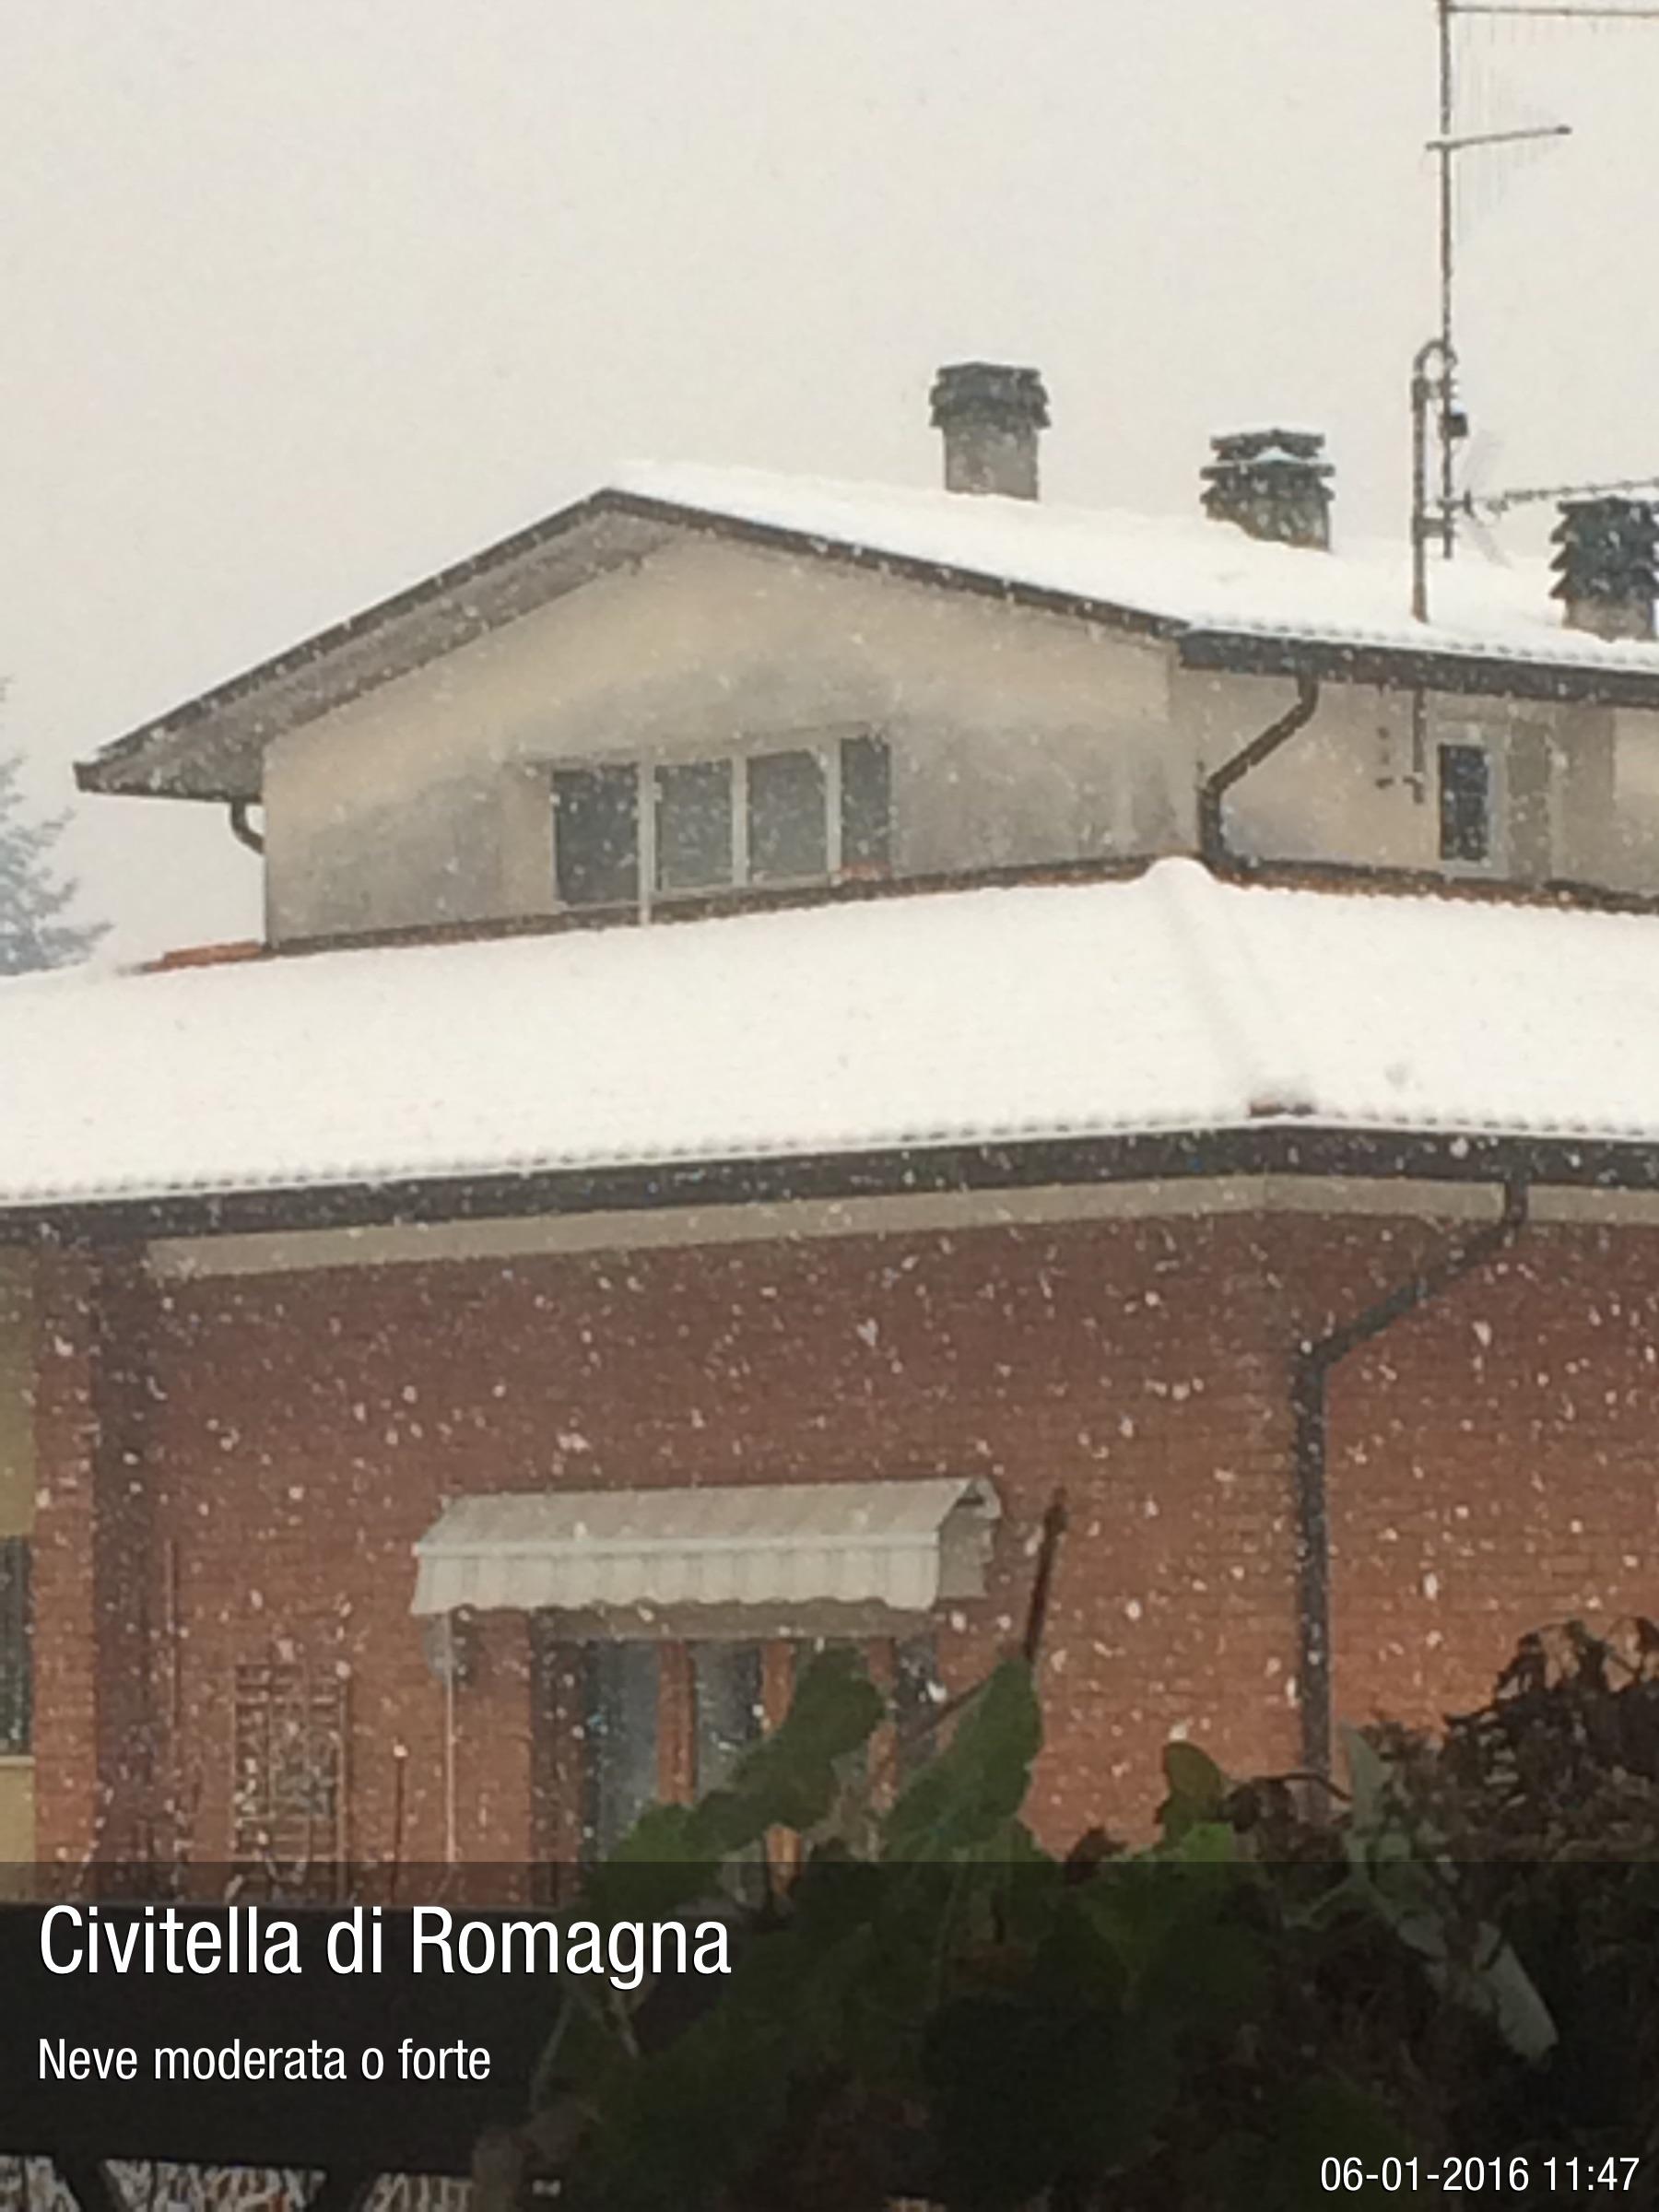 Foto meteo - Civitella di Romagna - Civitella di Romagna ore 11:47 ...